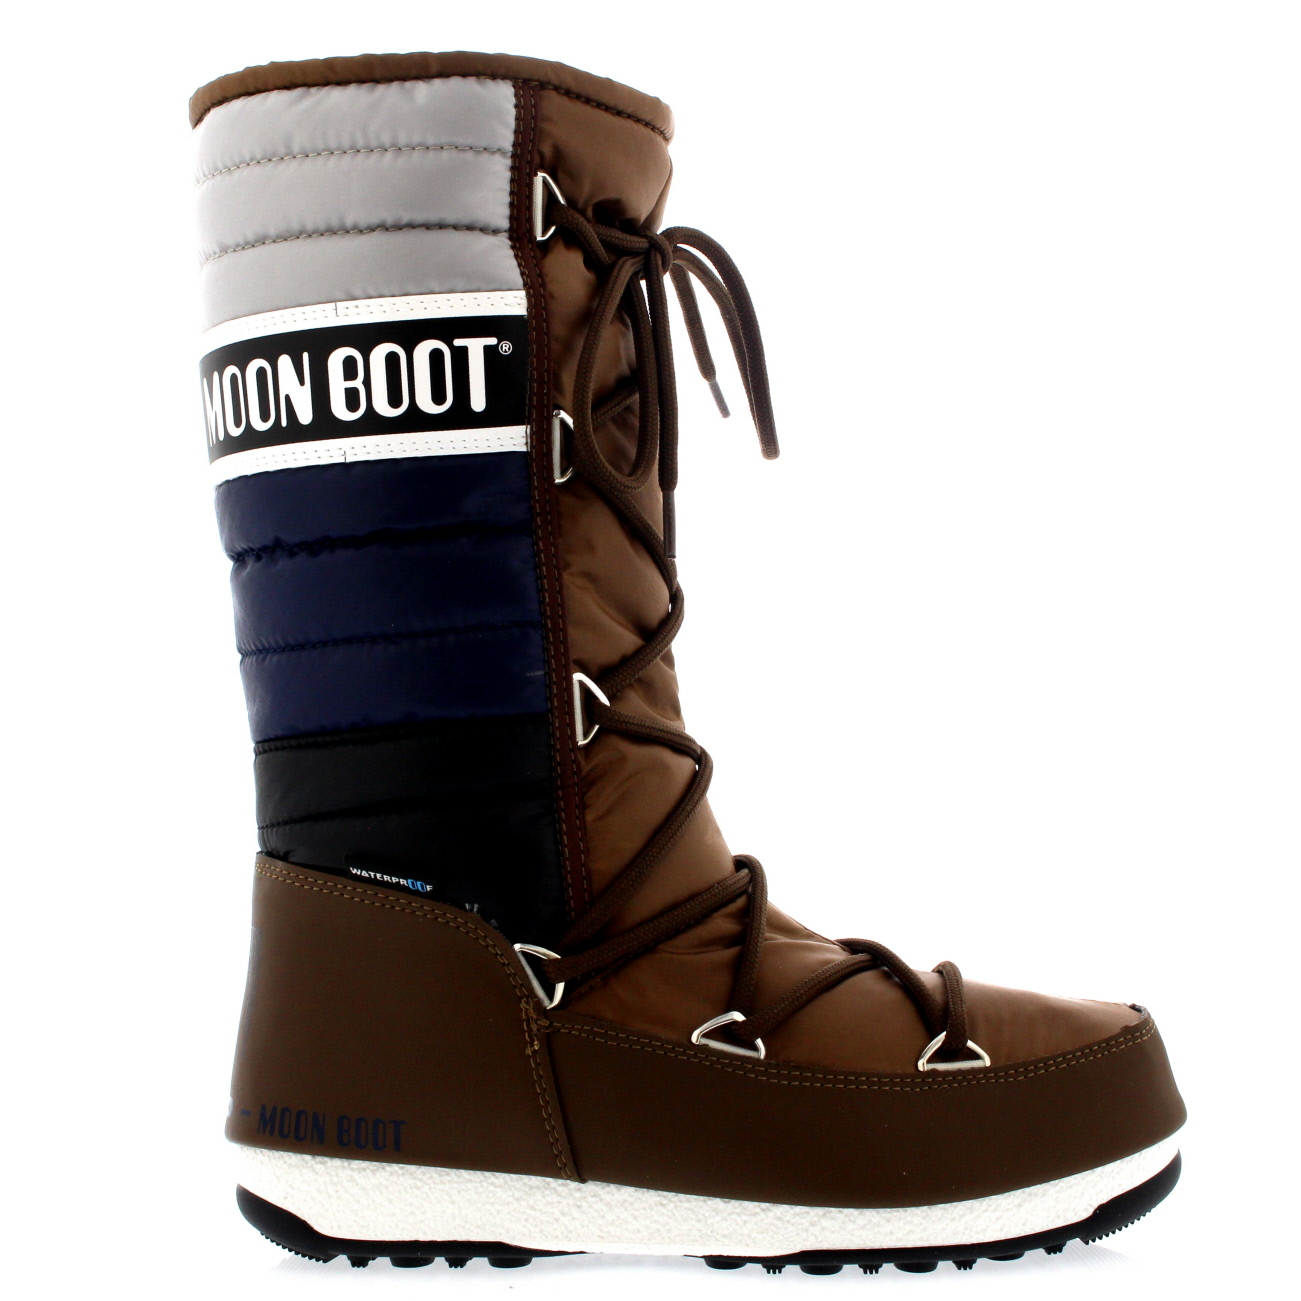 Damenschuhe Tecnica Calf Original Moon Boot Quilted Waterproof Snow Mid Calf Tecnica Stiefel UK 3-8 7b420e